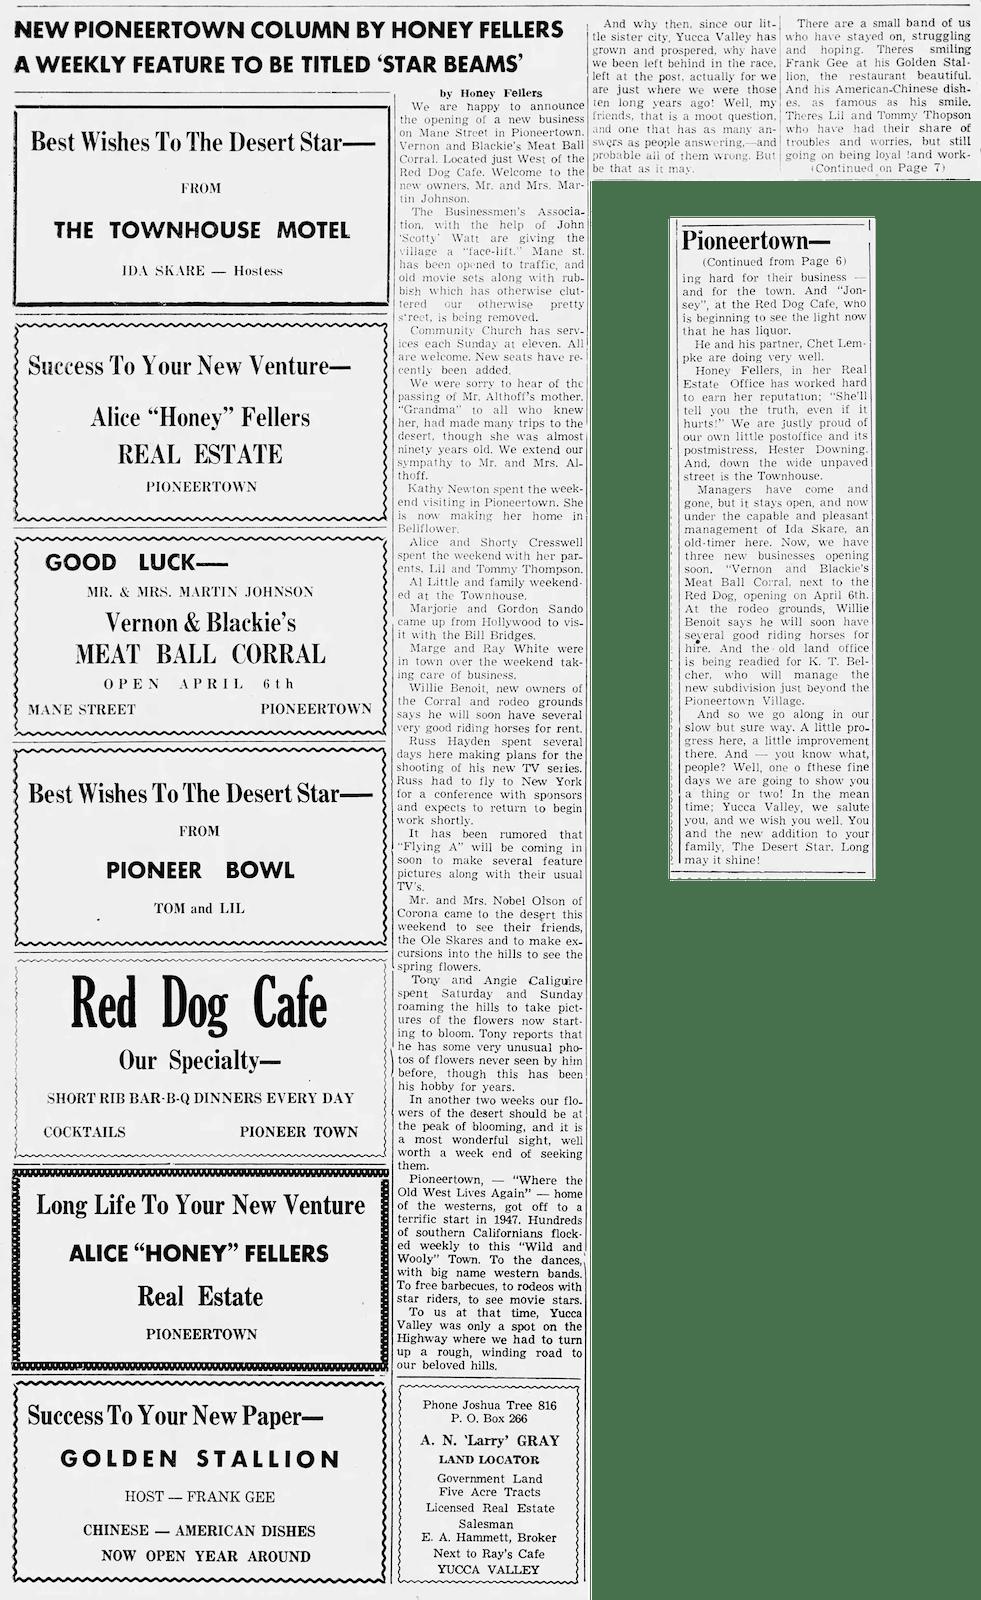 Apr. 3, 1957 - The Desert Star clipping